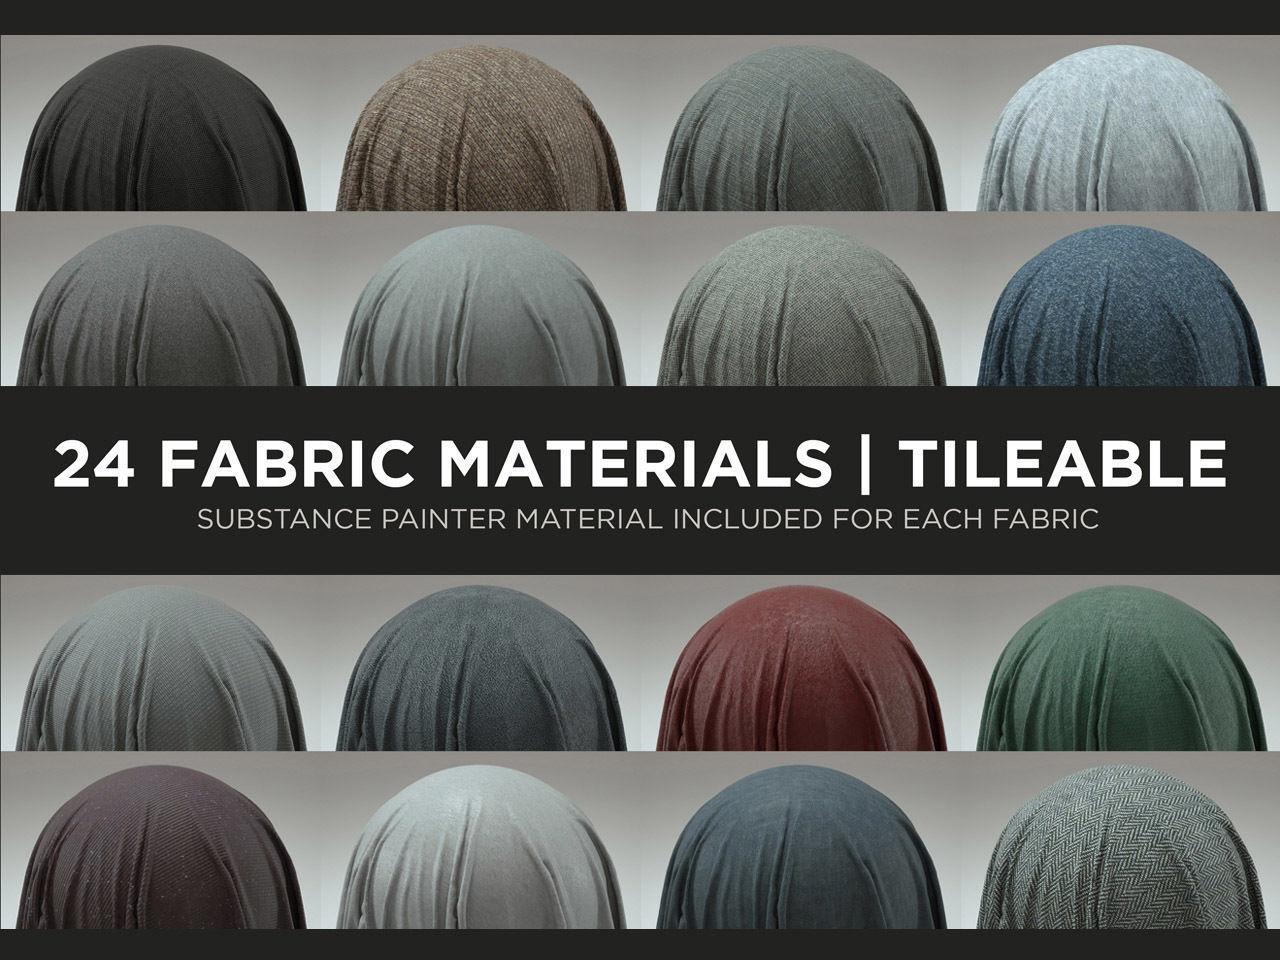 24 Fabric Materials - Part 1